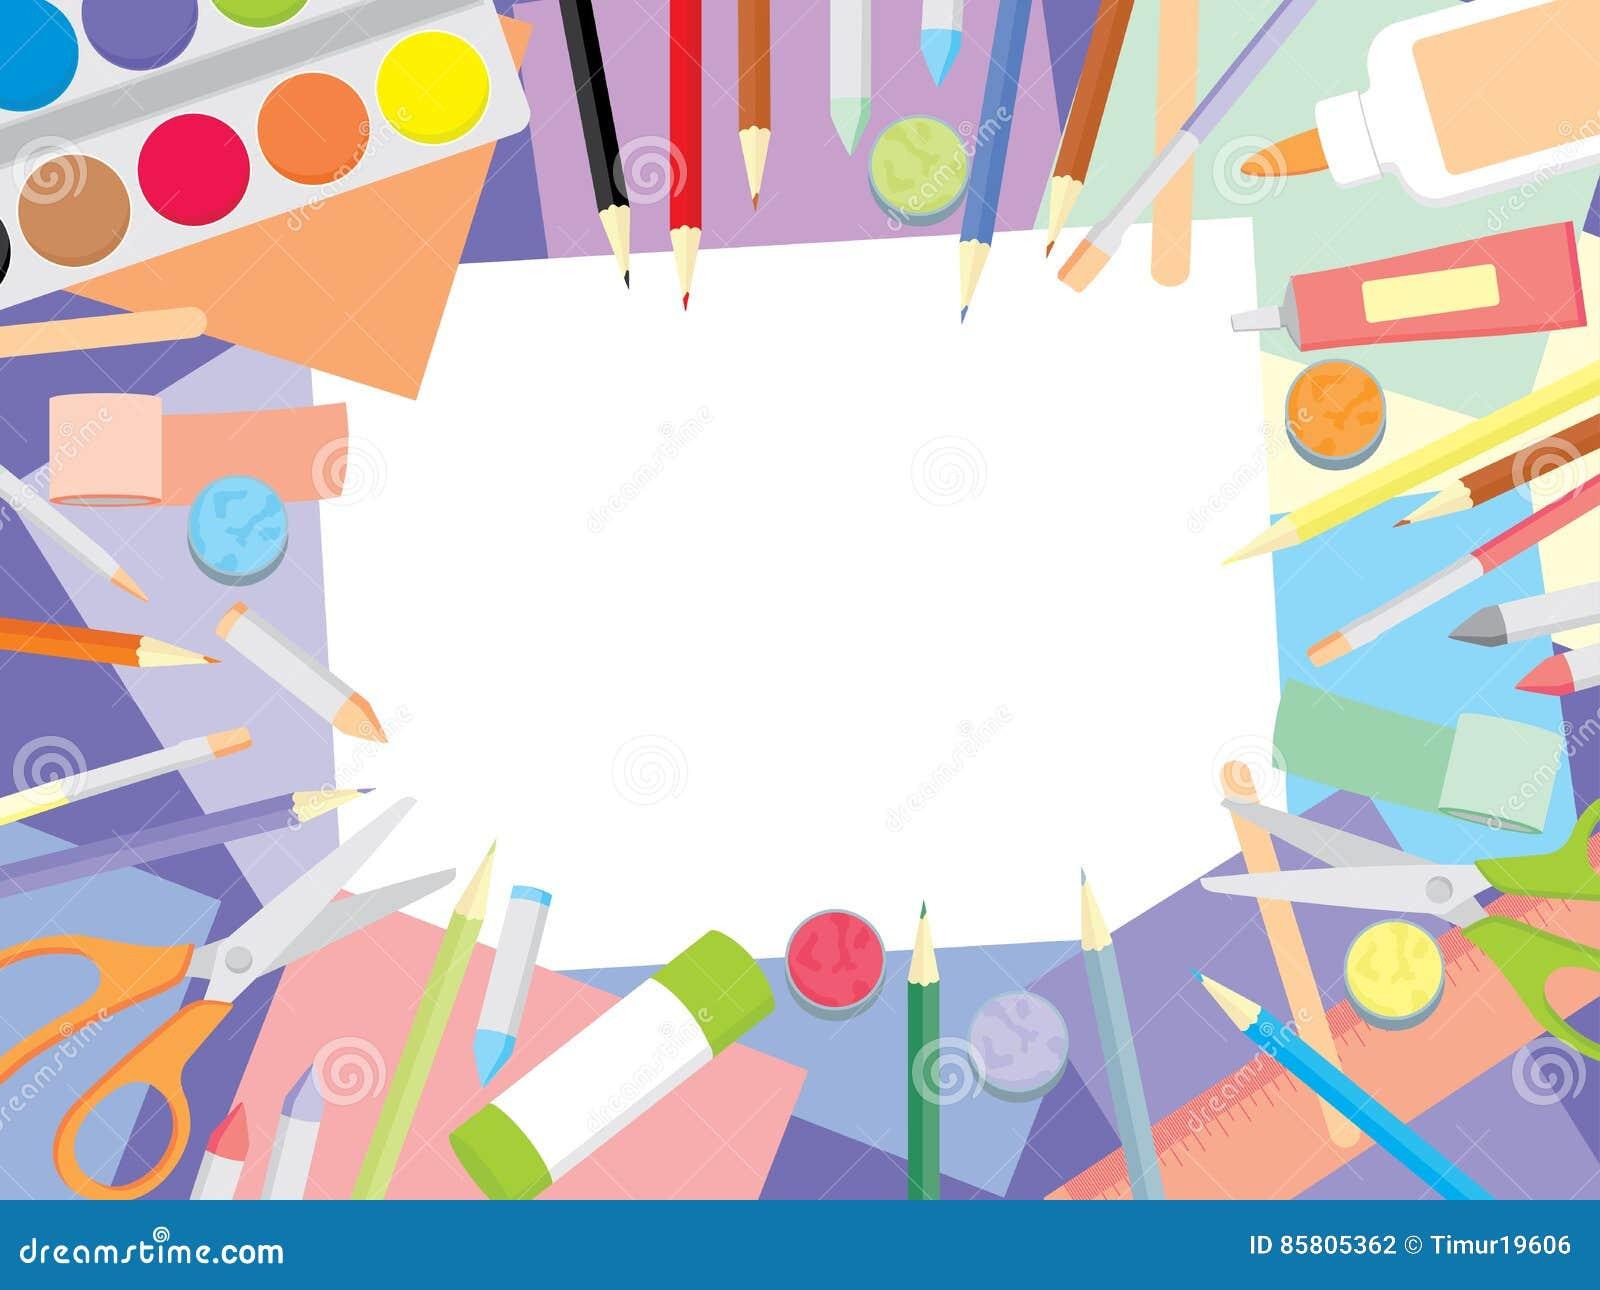 kids craft supplies stock vector illustration of